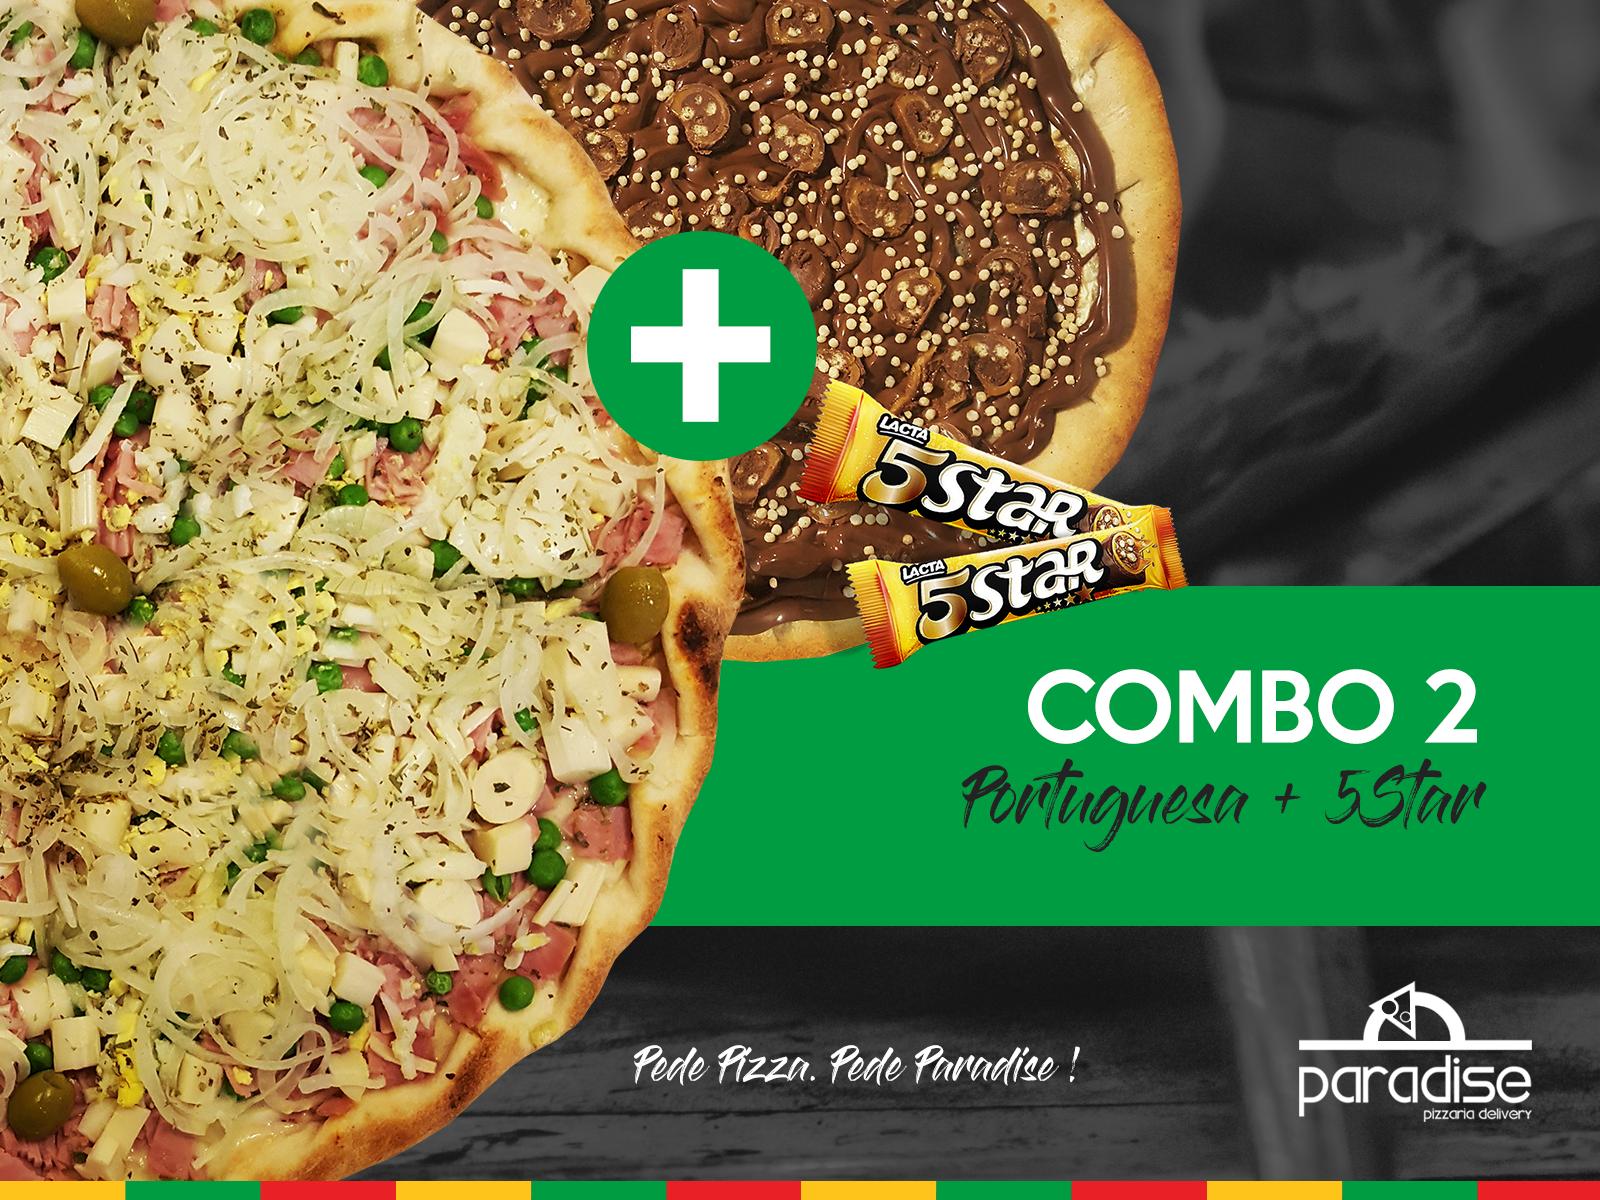 Promoção de Pizza - Combo 2 - Pizza de Portuguesa Grande + Pizza Broto de Chocolate 5Star